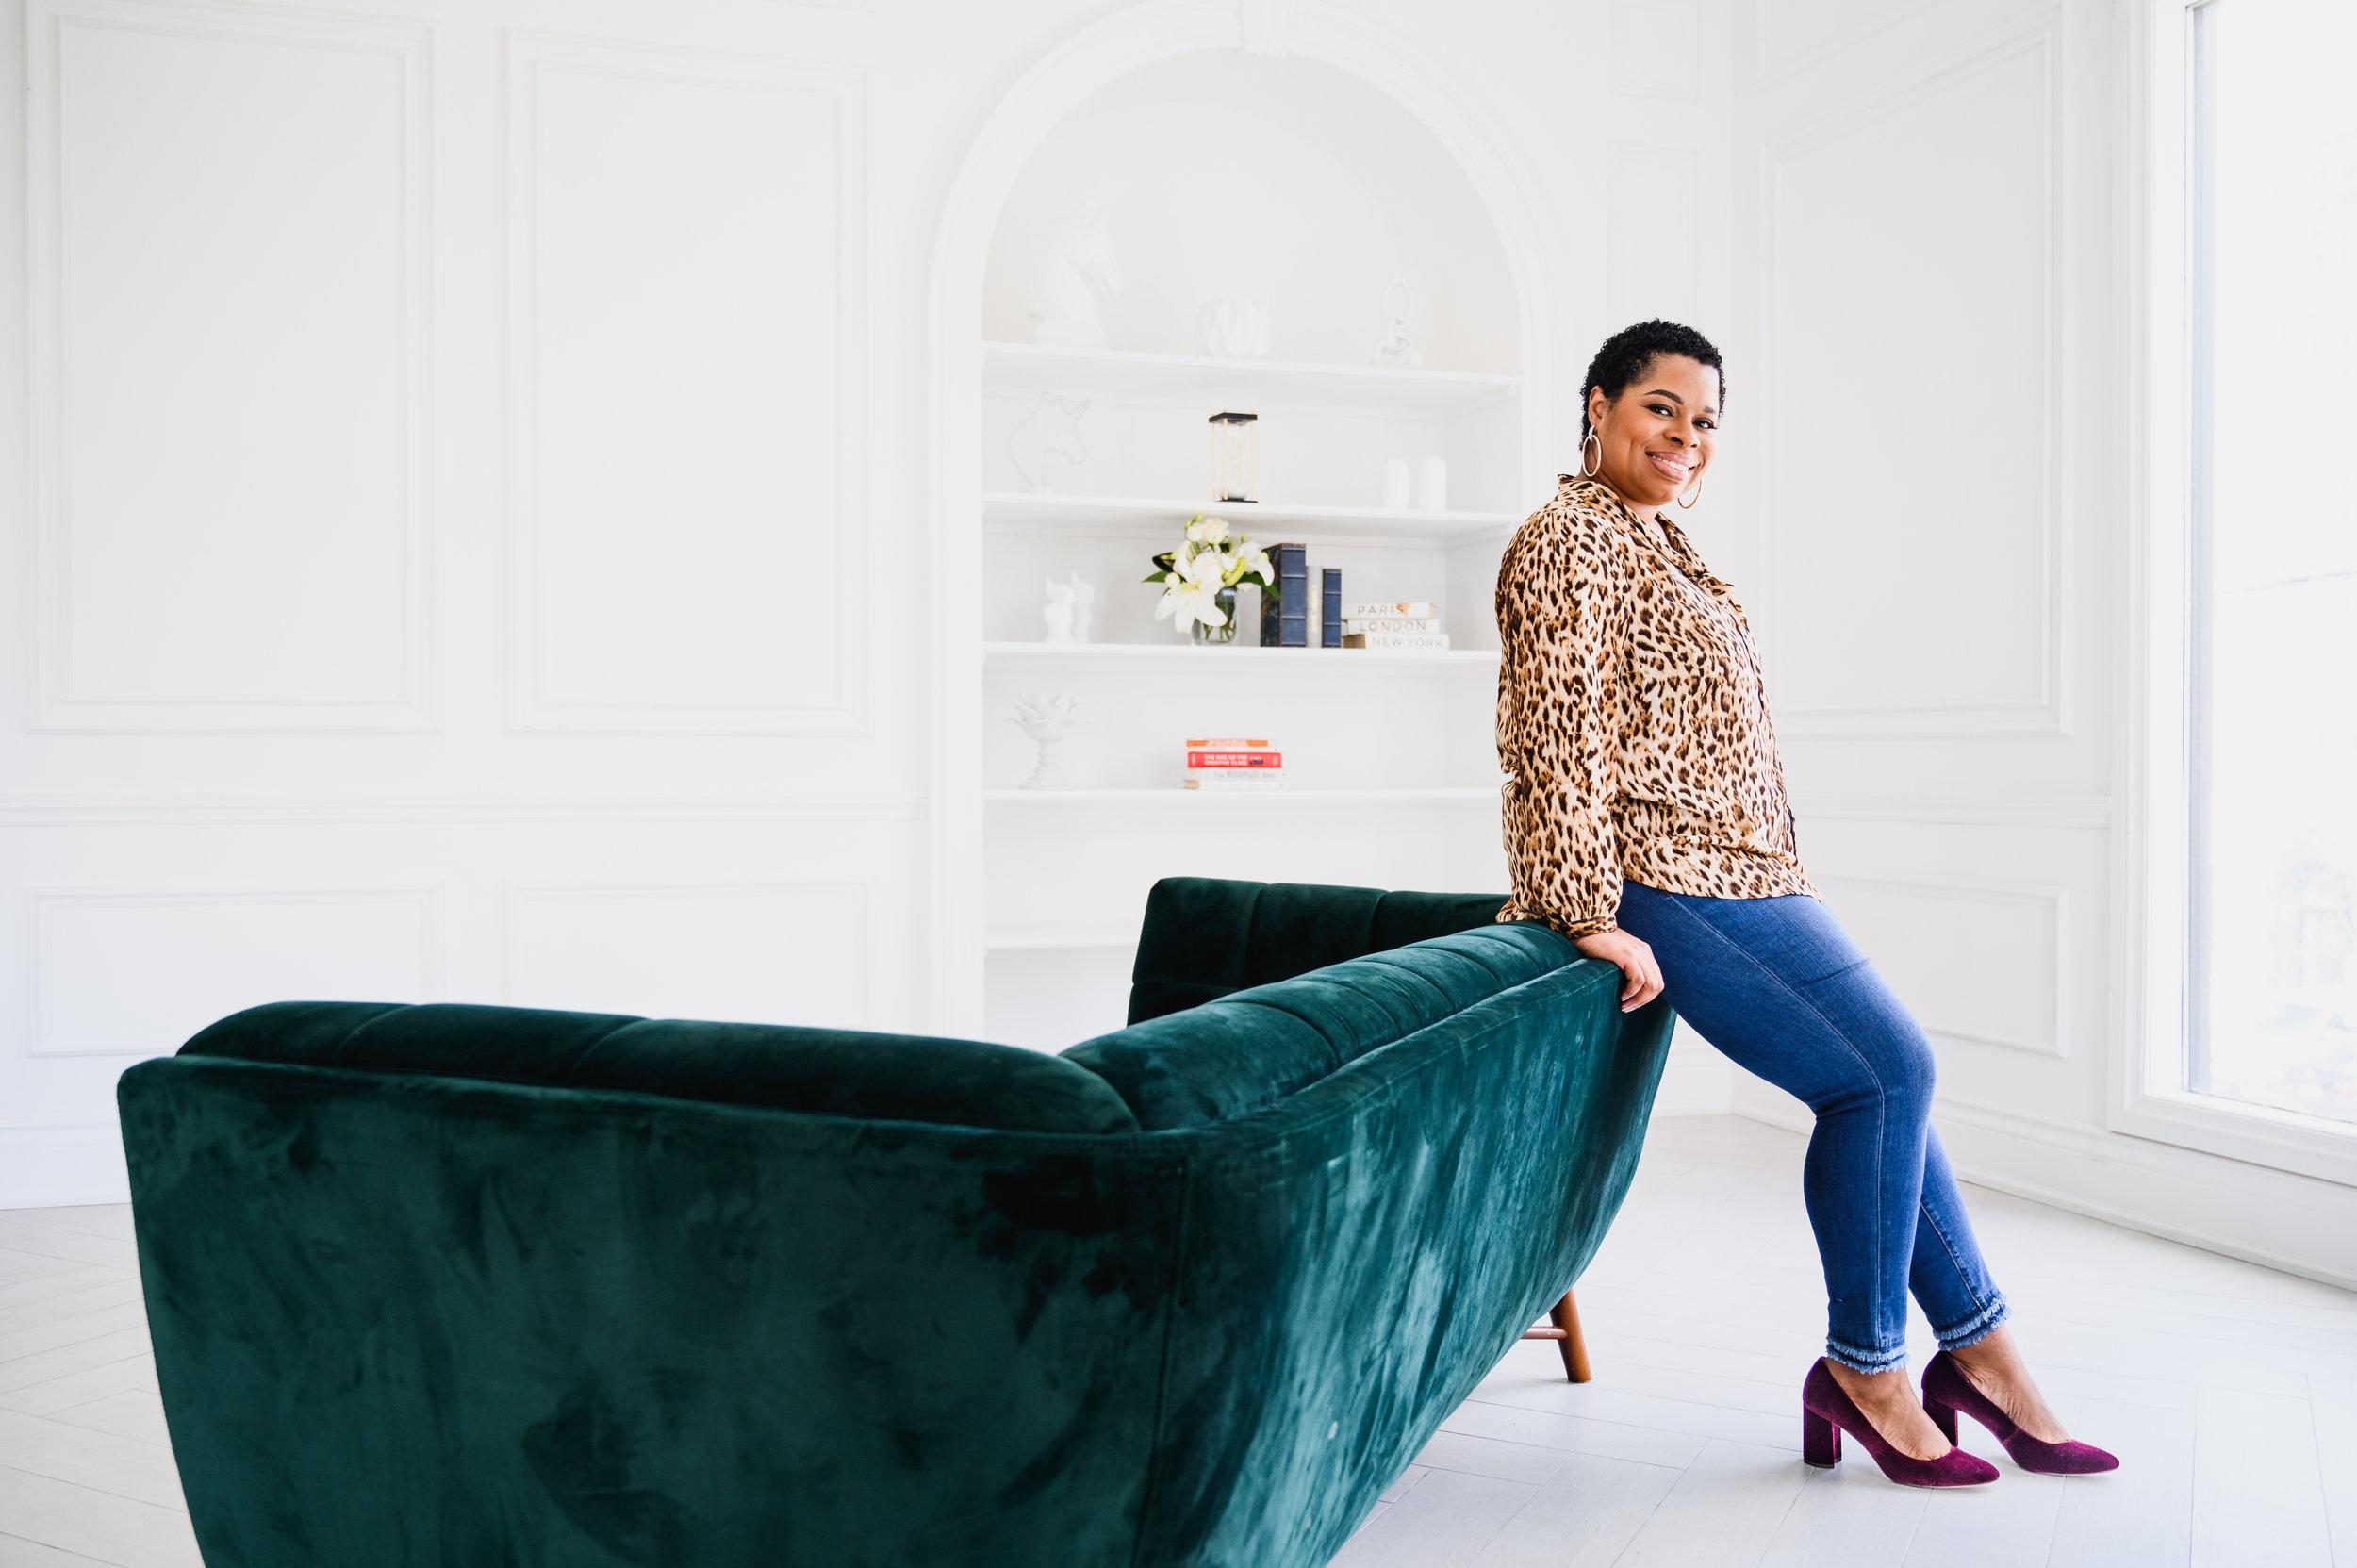 Andrea Henry Business LAW - PRINT - 2019 - Branding Photography - Mike Black PhotoWorks dot com-5.jpg